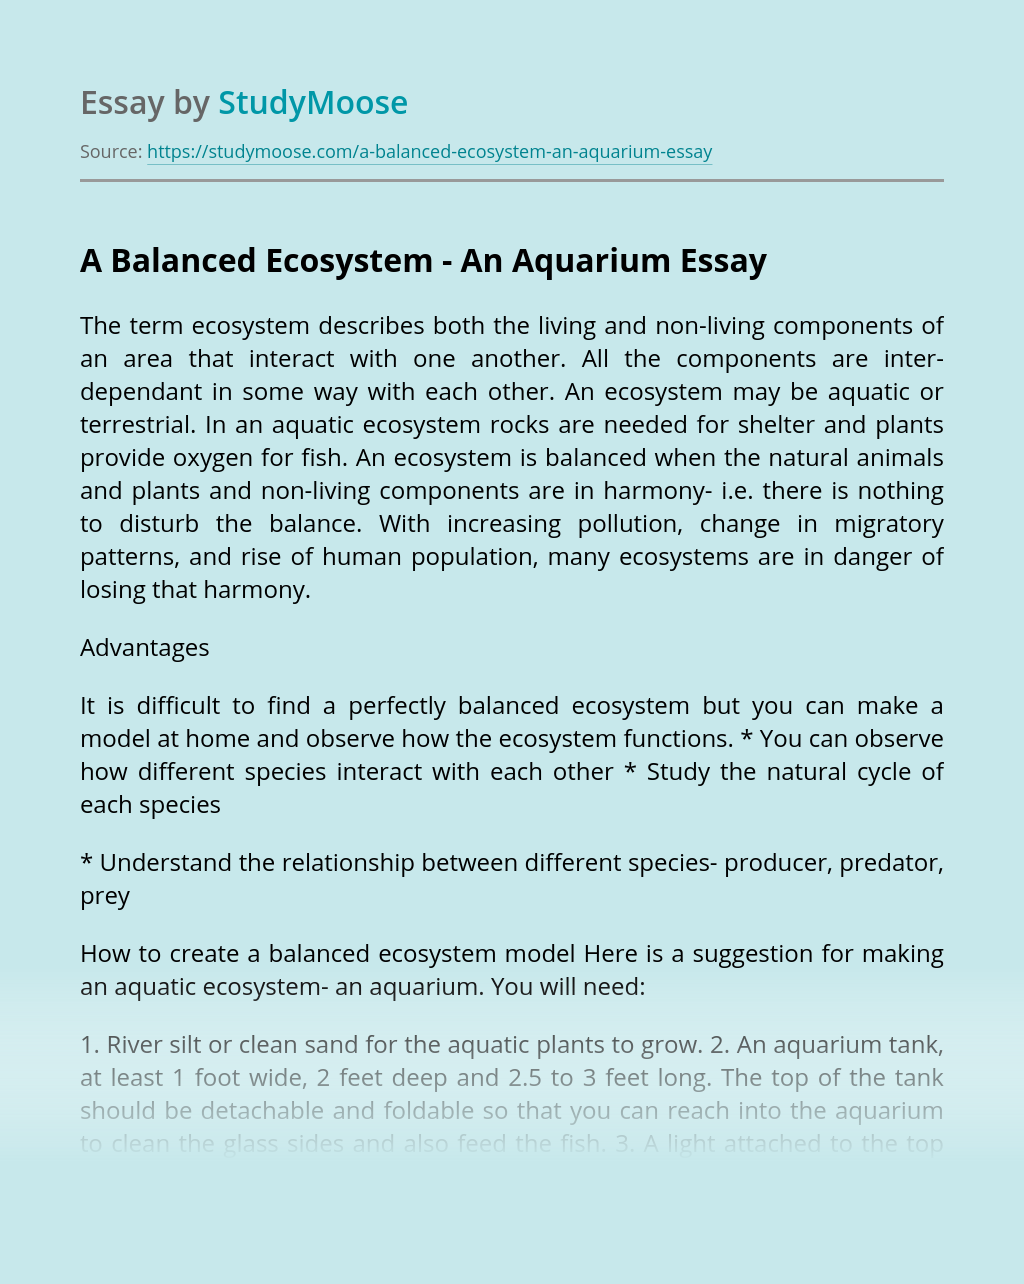 A Balanced Ecosystem - An Aquarium